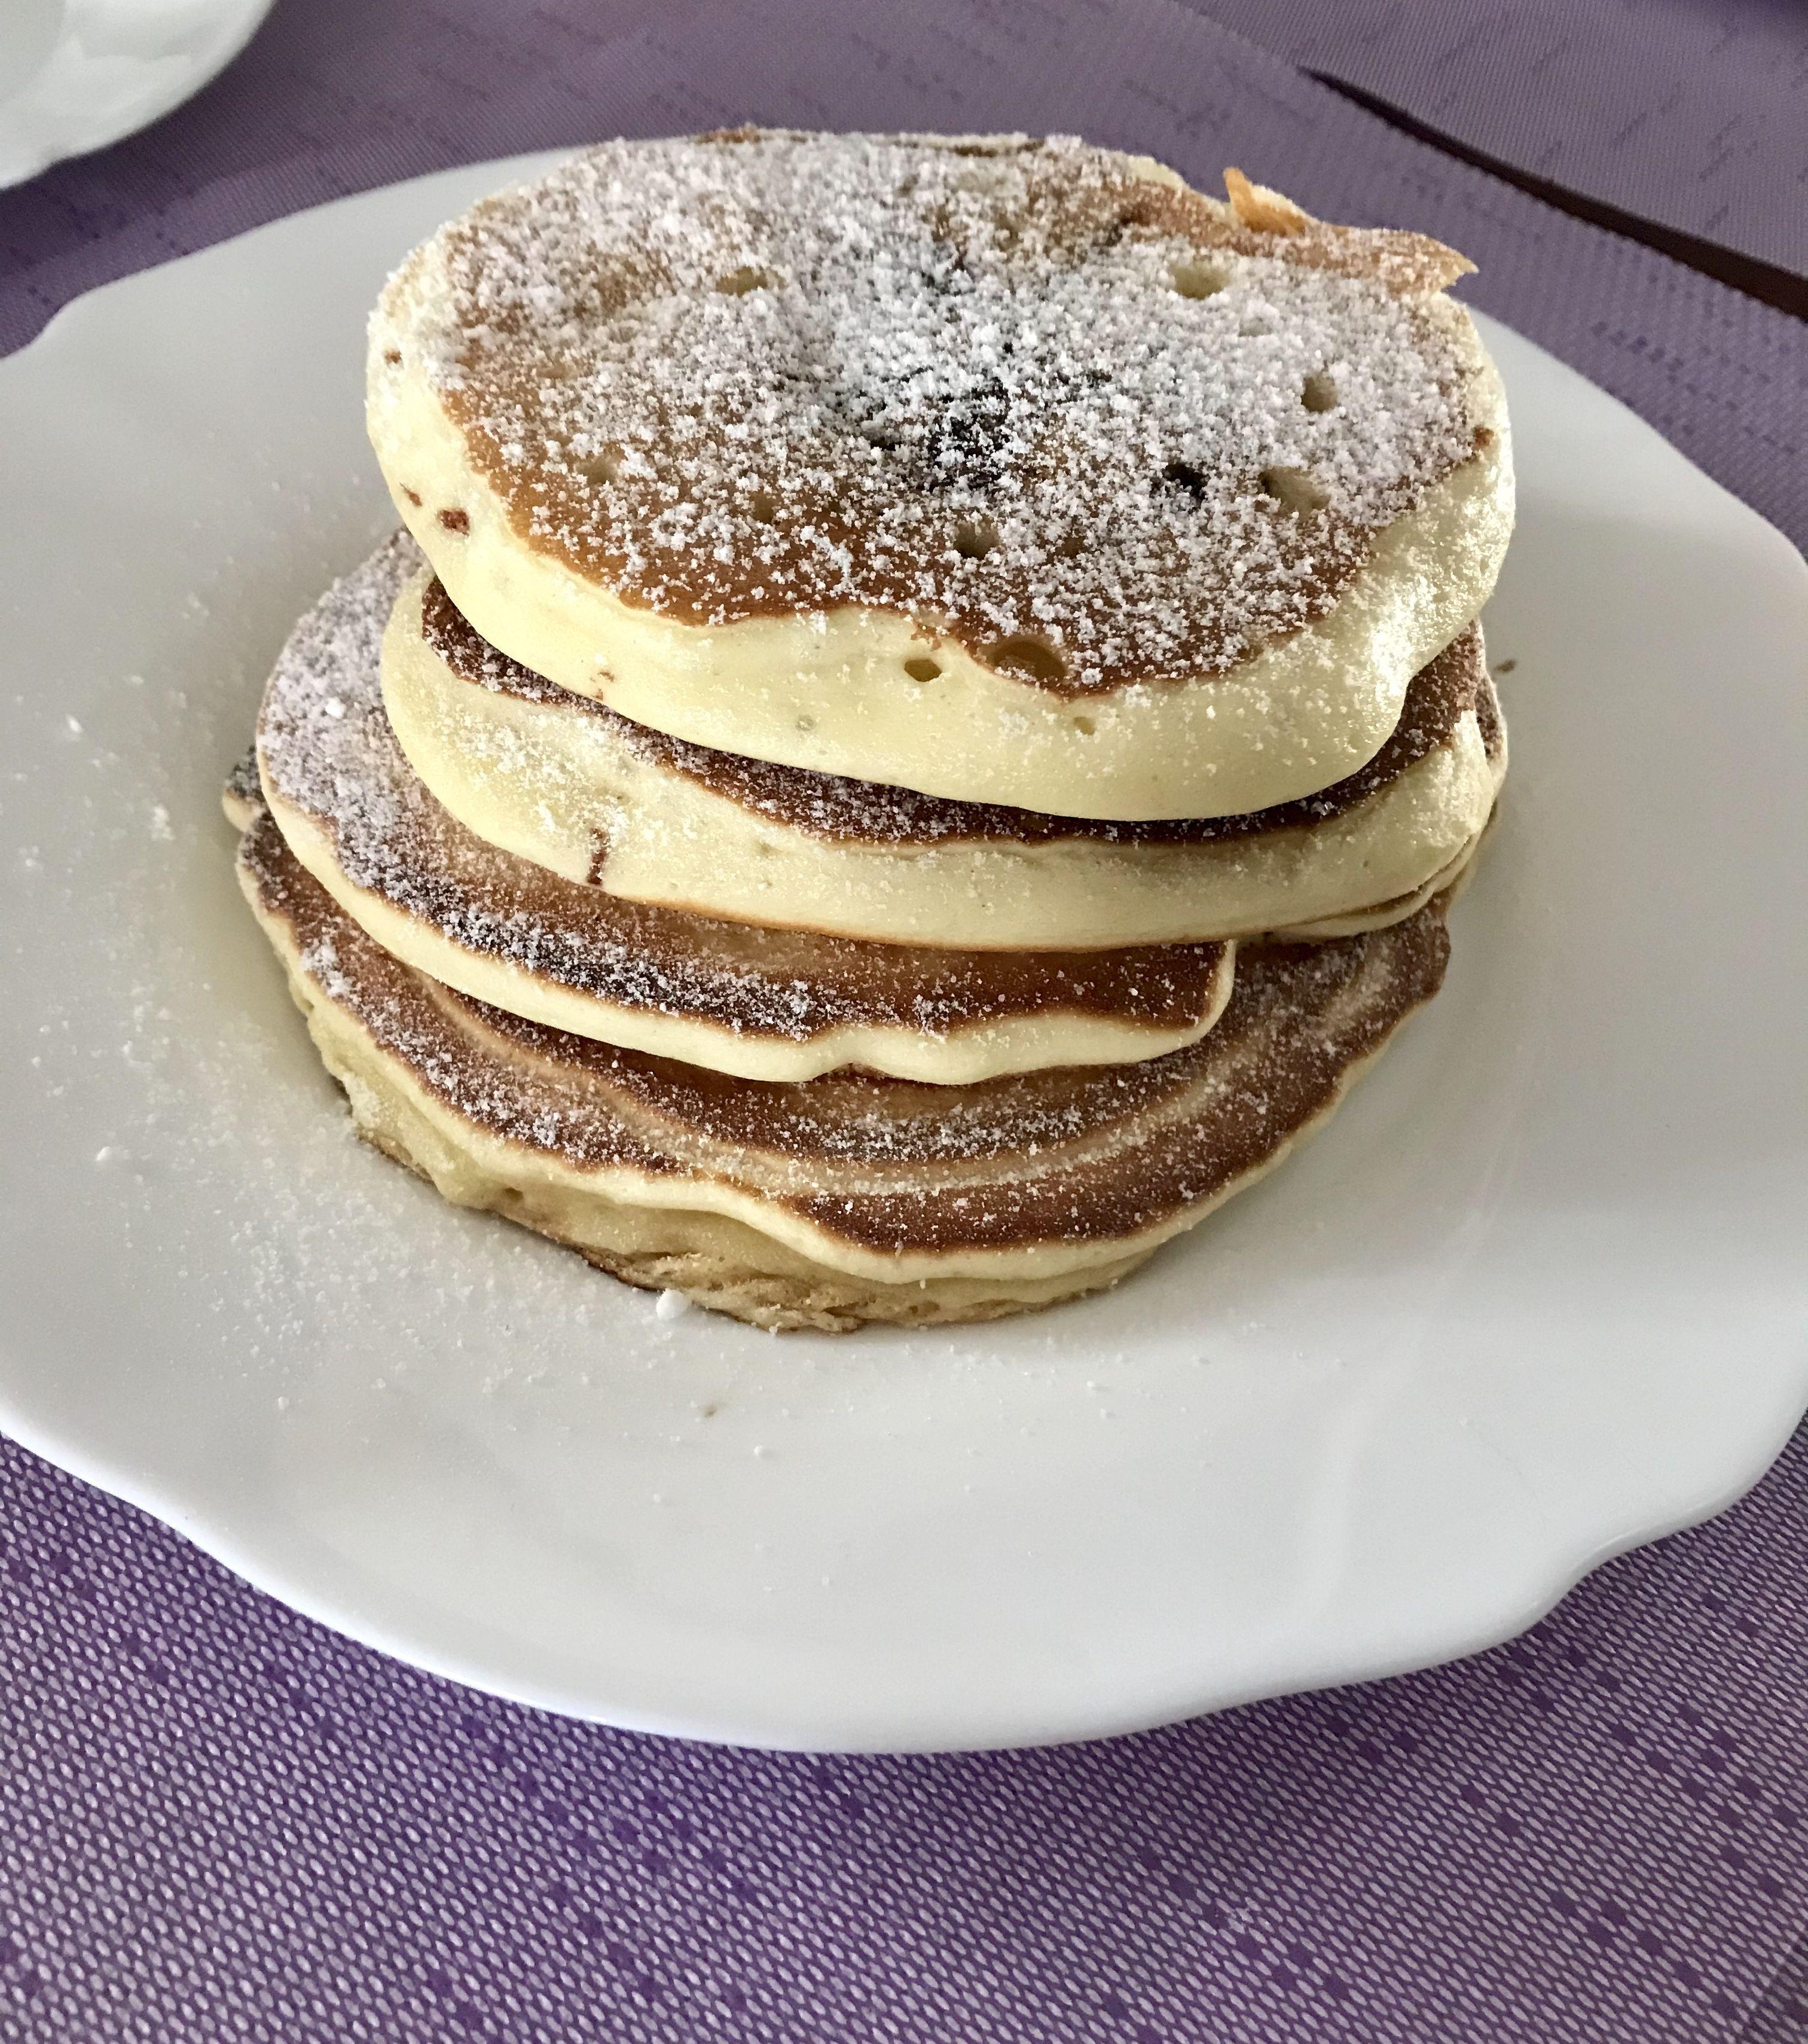 a6f61b8286c4fc9966a37a916cdda0b2 - Ricetta Pancake Con Nutella